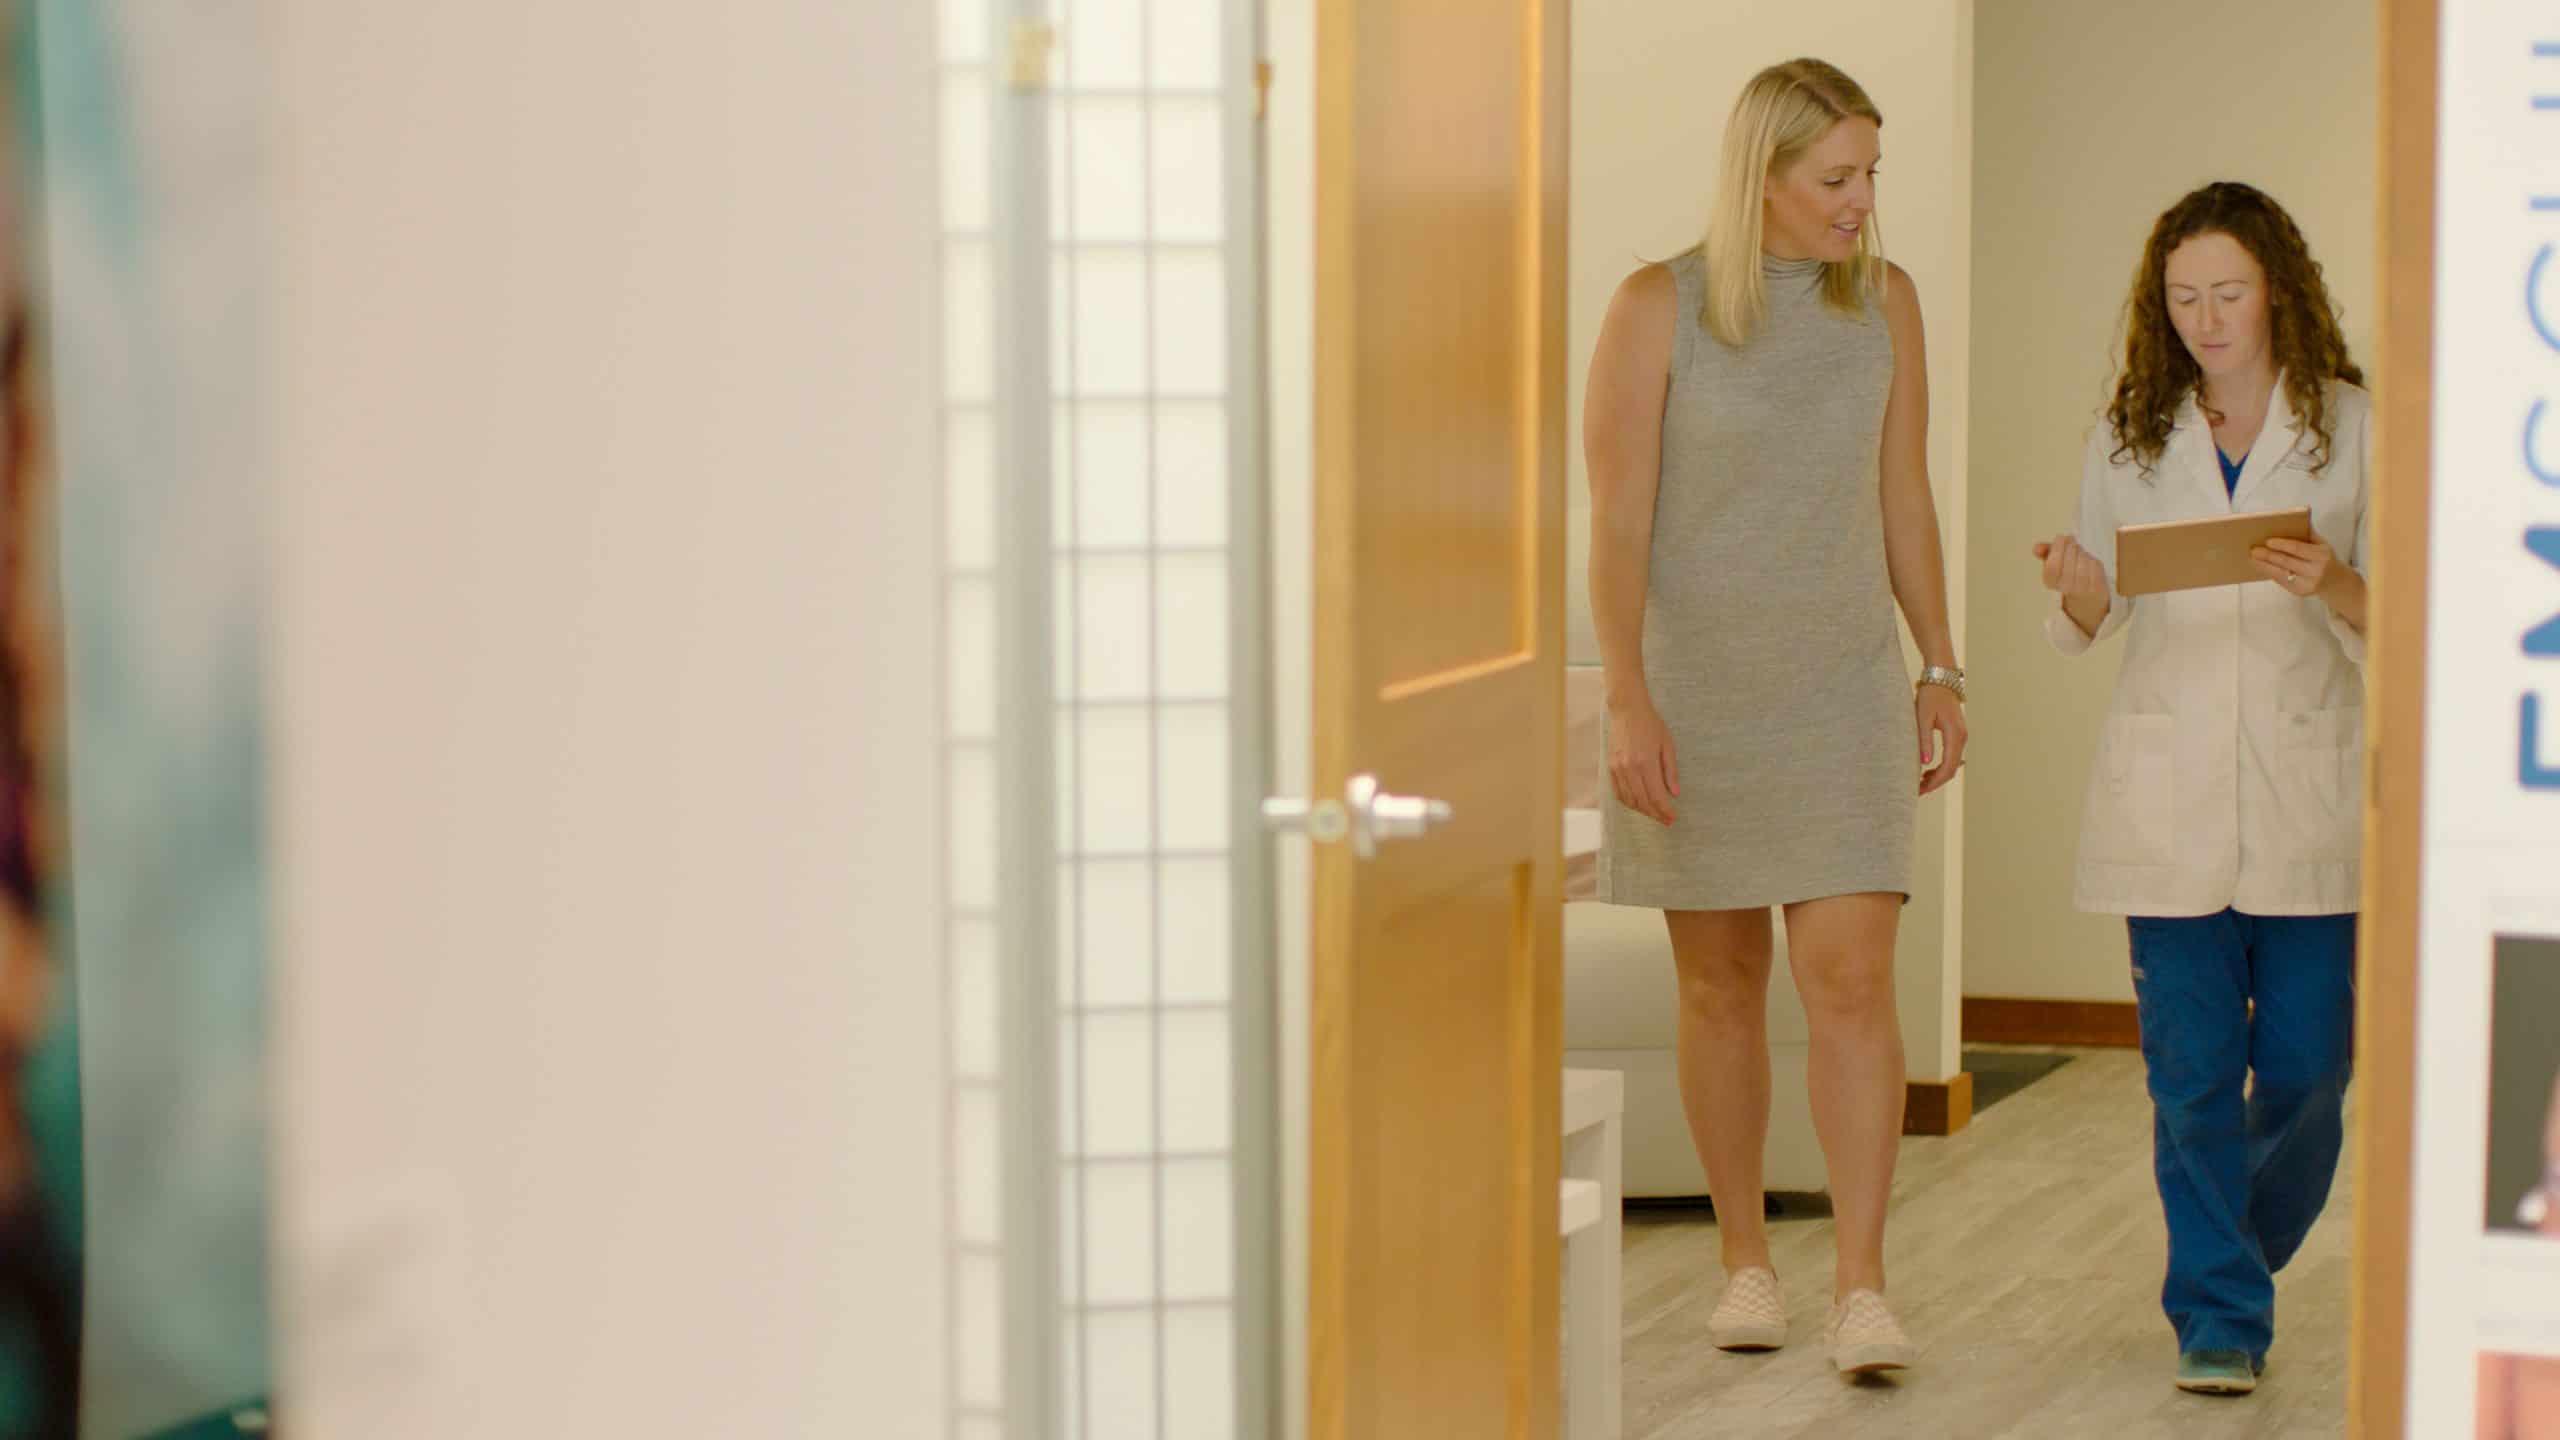 Sarah walking with patient